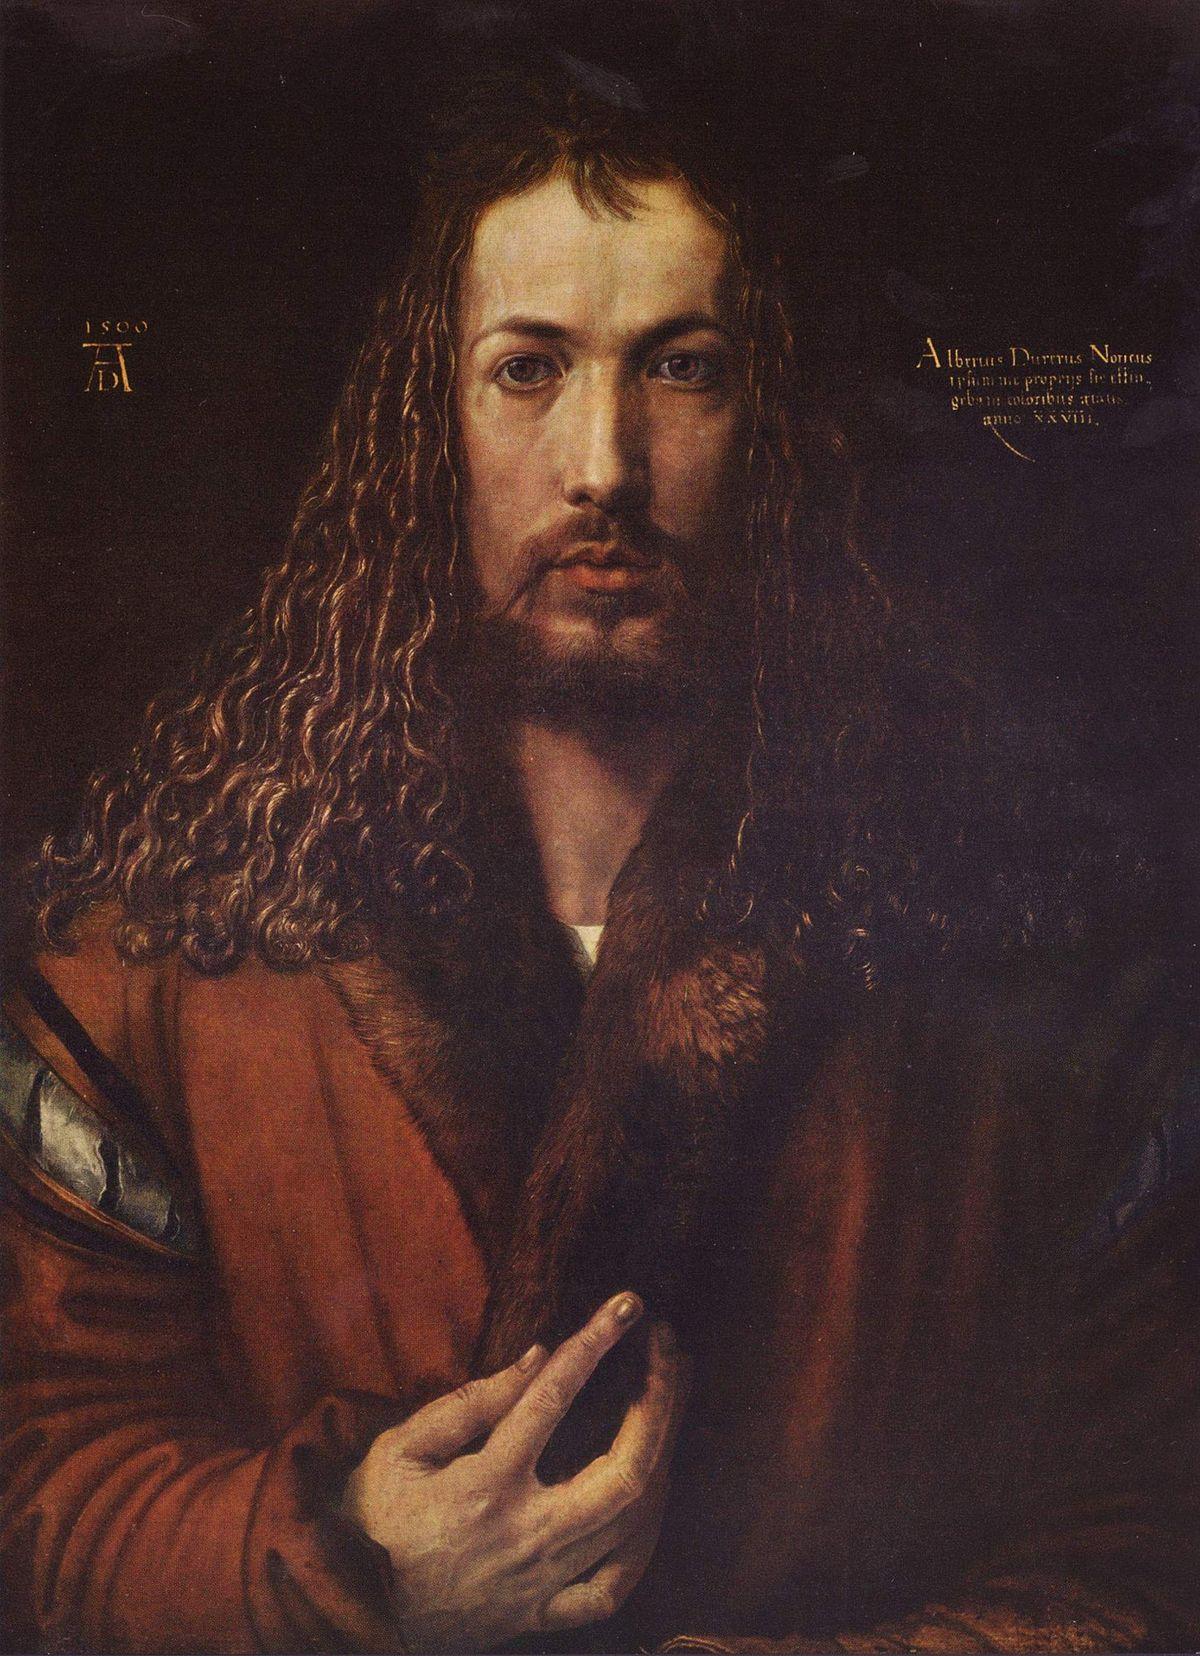 Albrecht Durer - Selbstbildnis im Pelzrock - Alte Pinakothek.jpg